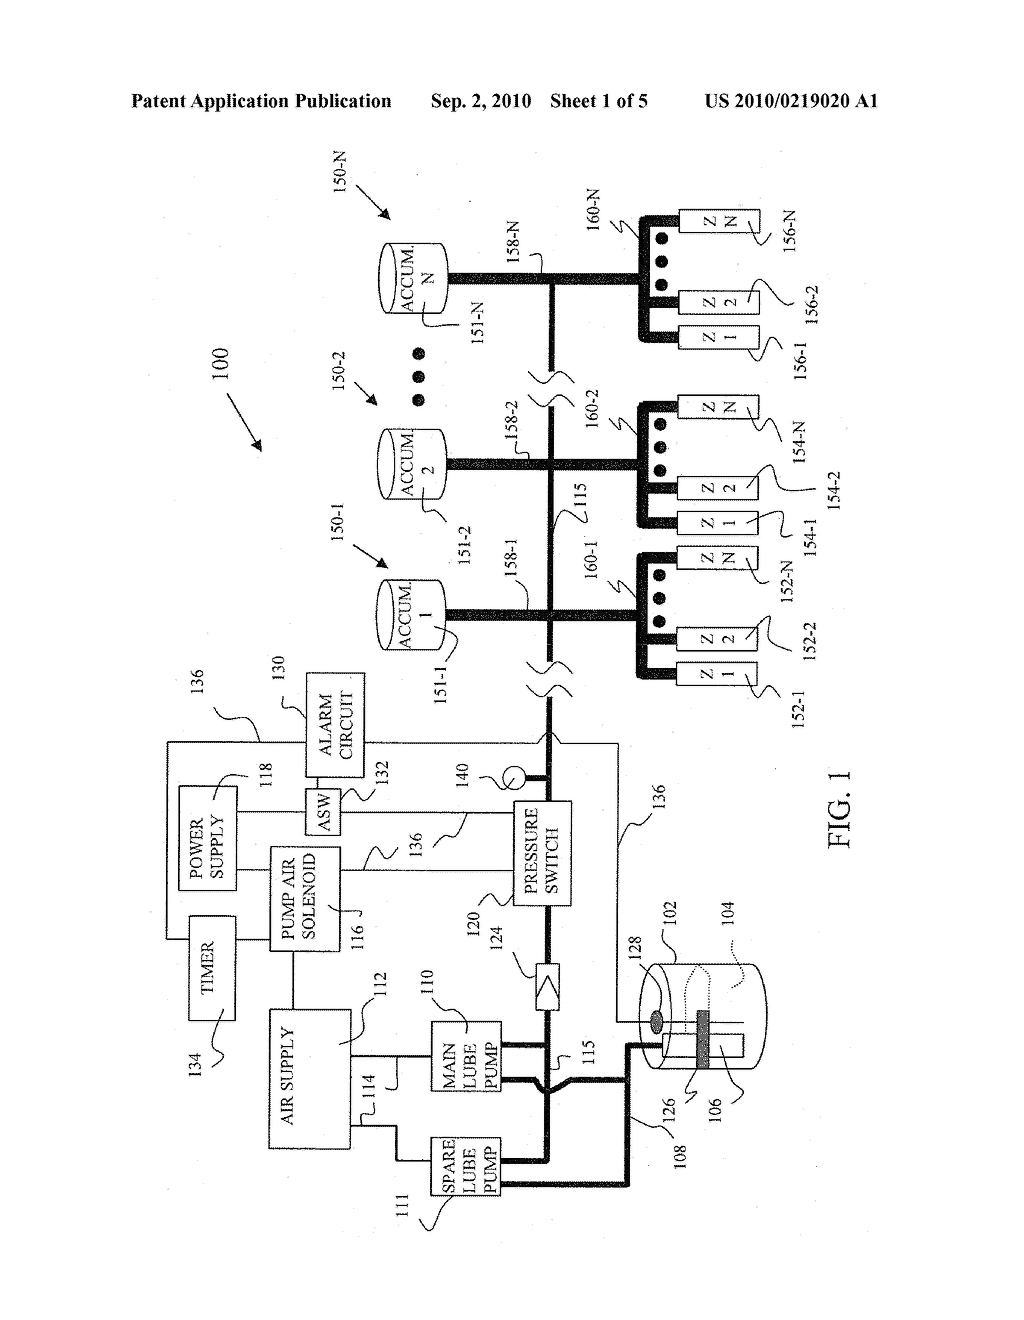 pressure accumulator tank system for applying a substance diagram rh patentsencyclopedia com Accumulator Repair Manual Nitrogen Accumulator